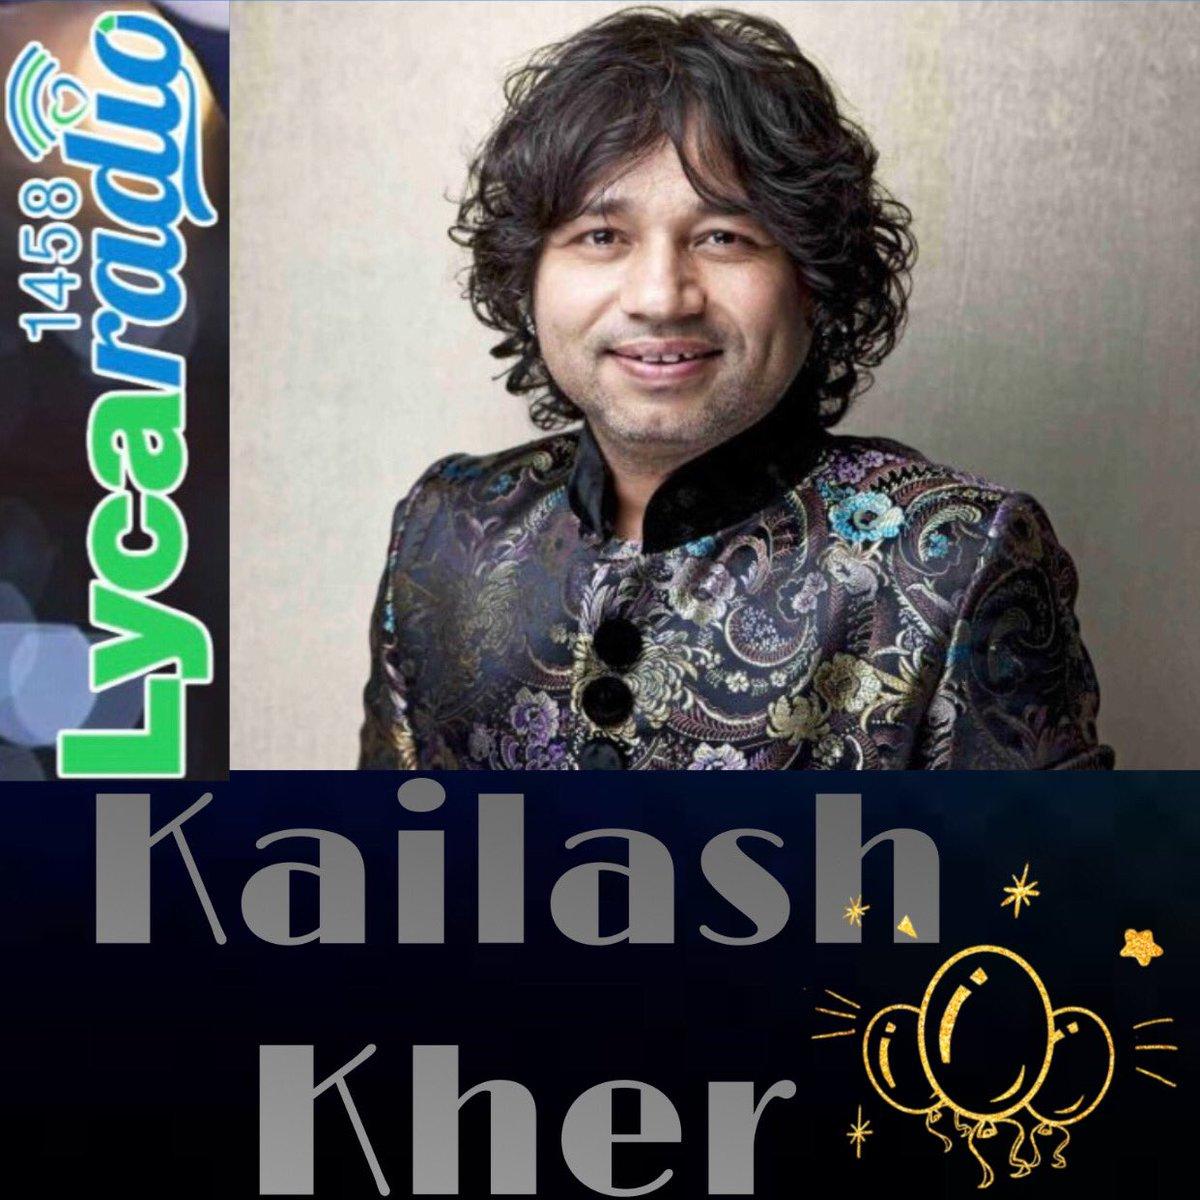 We Lyca  it.. #HappyBirthday #KailashKher #singer #legend #DidYouKnow By 2014, he had sung in more than 20 Indian languages, including Malayalam, Tamil, Telugu, Kannada, Oriya, Bengali, Sindhi, Bhojpuri, Gujarati, Marathi, Punjabi, Konkani, Rajasthani… @Kailashkherpic.twitter.com/TLisAnQVrh